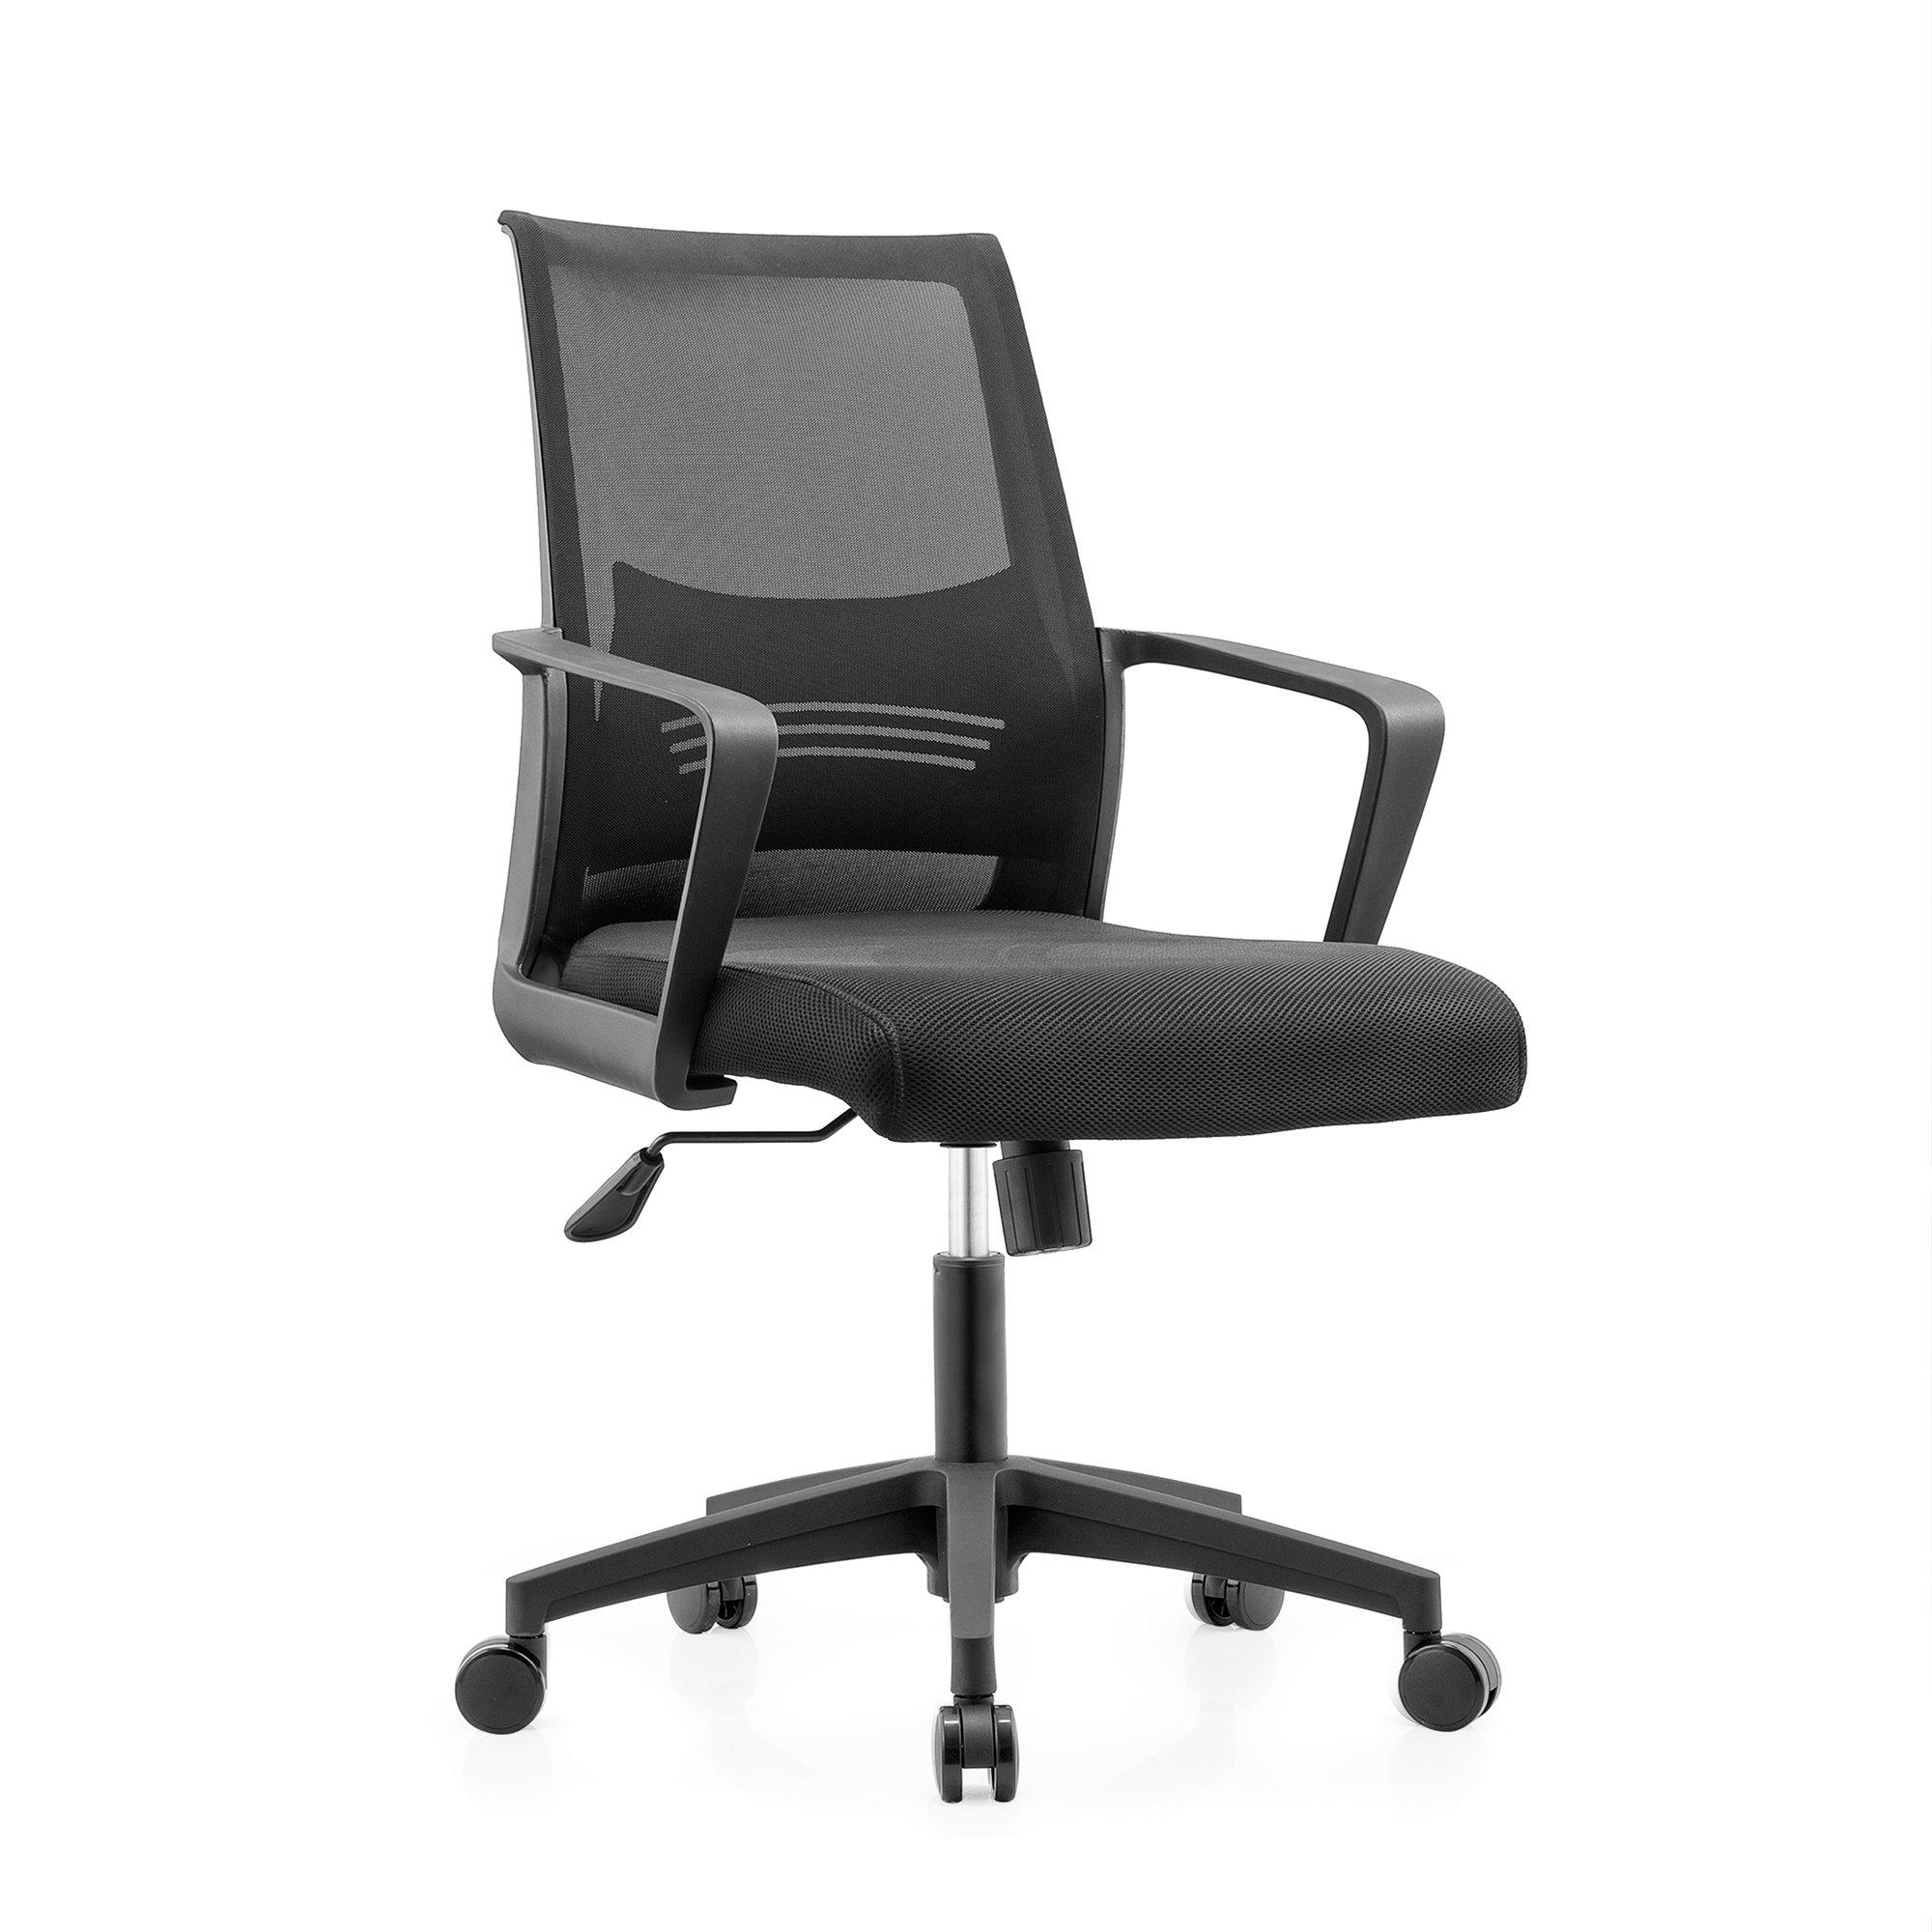 lumbar support office chair horse saddle desk ergonomic mid back swivel computer mesh with armrest black lumbo walmart com